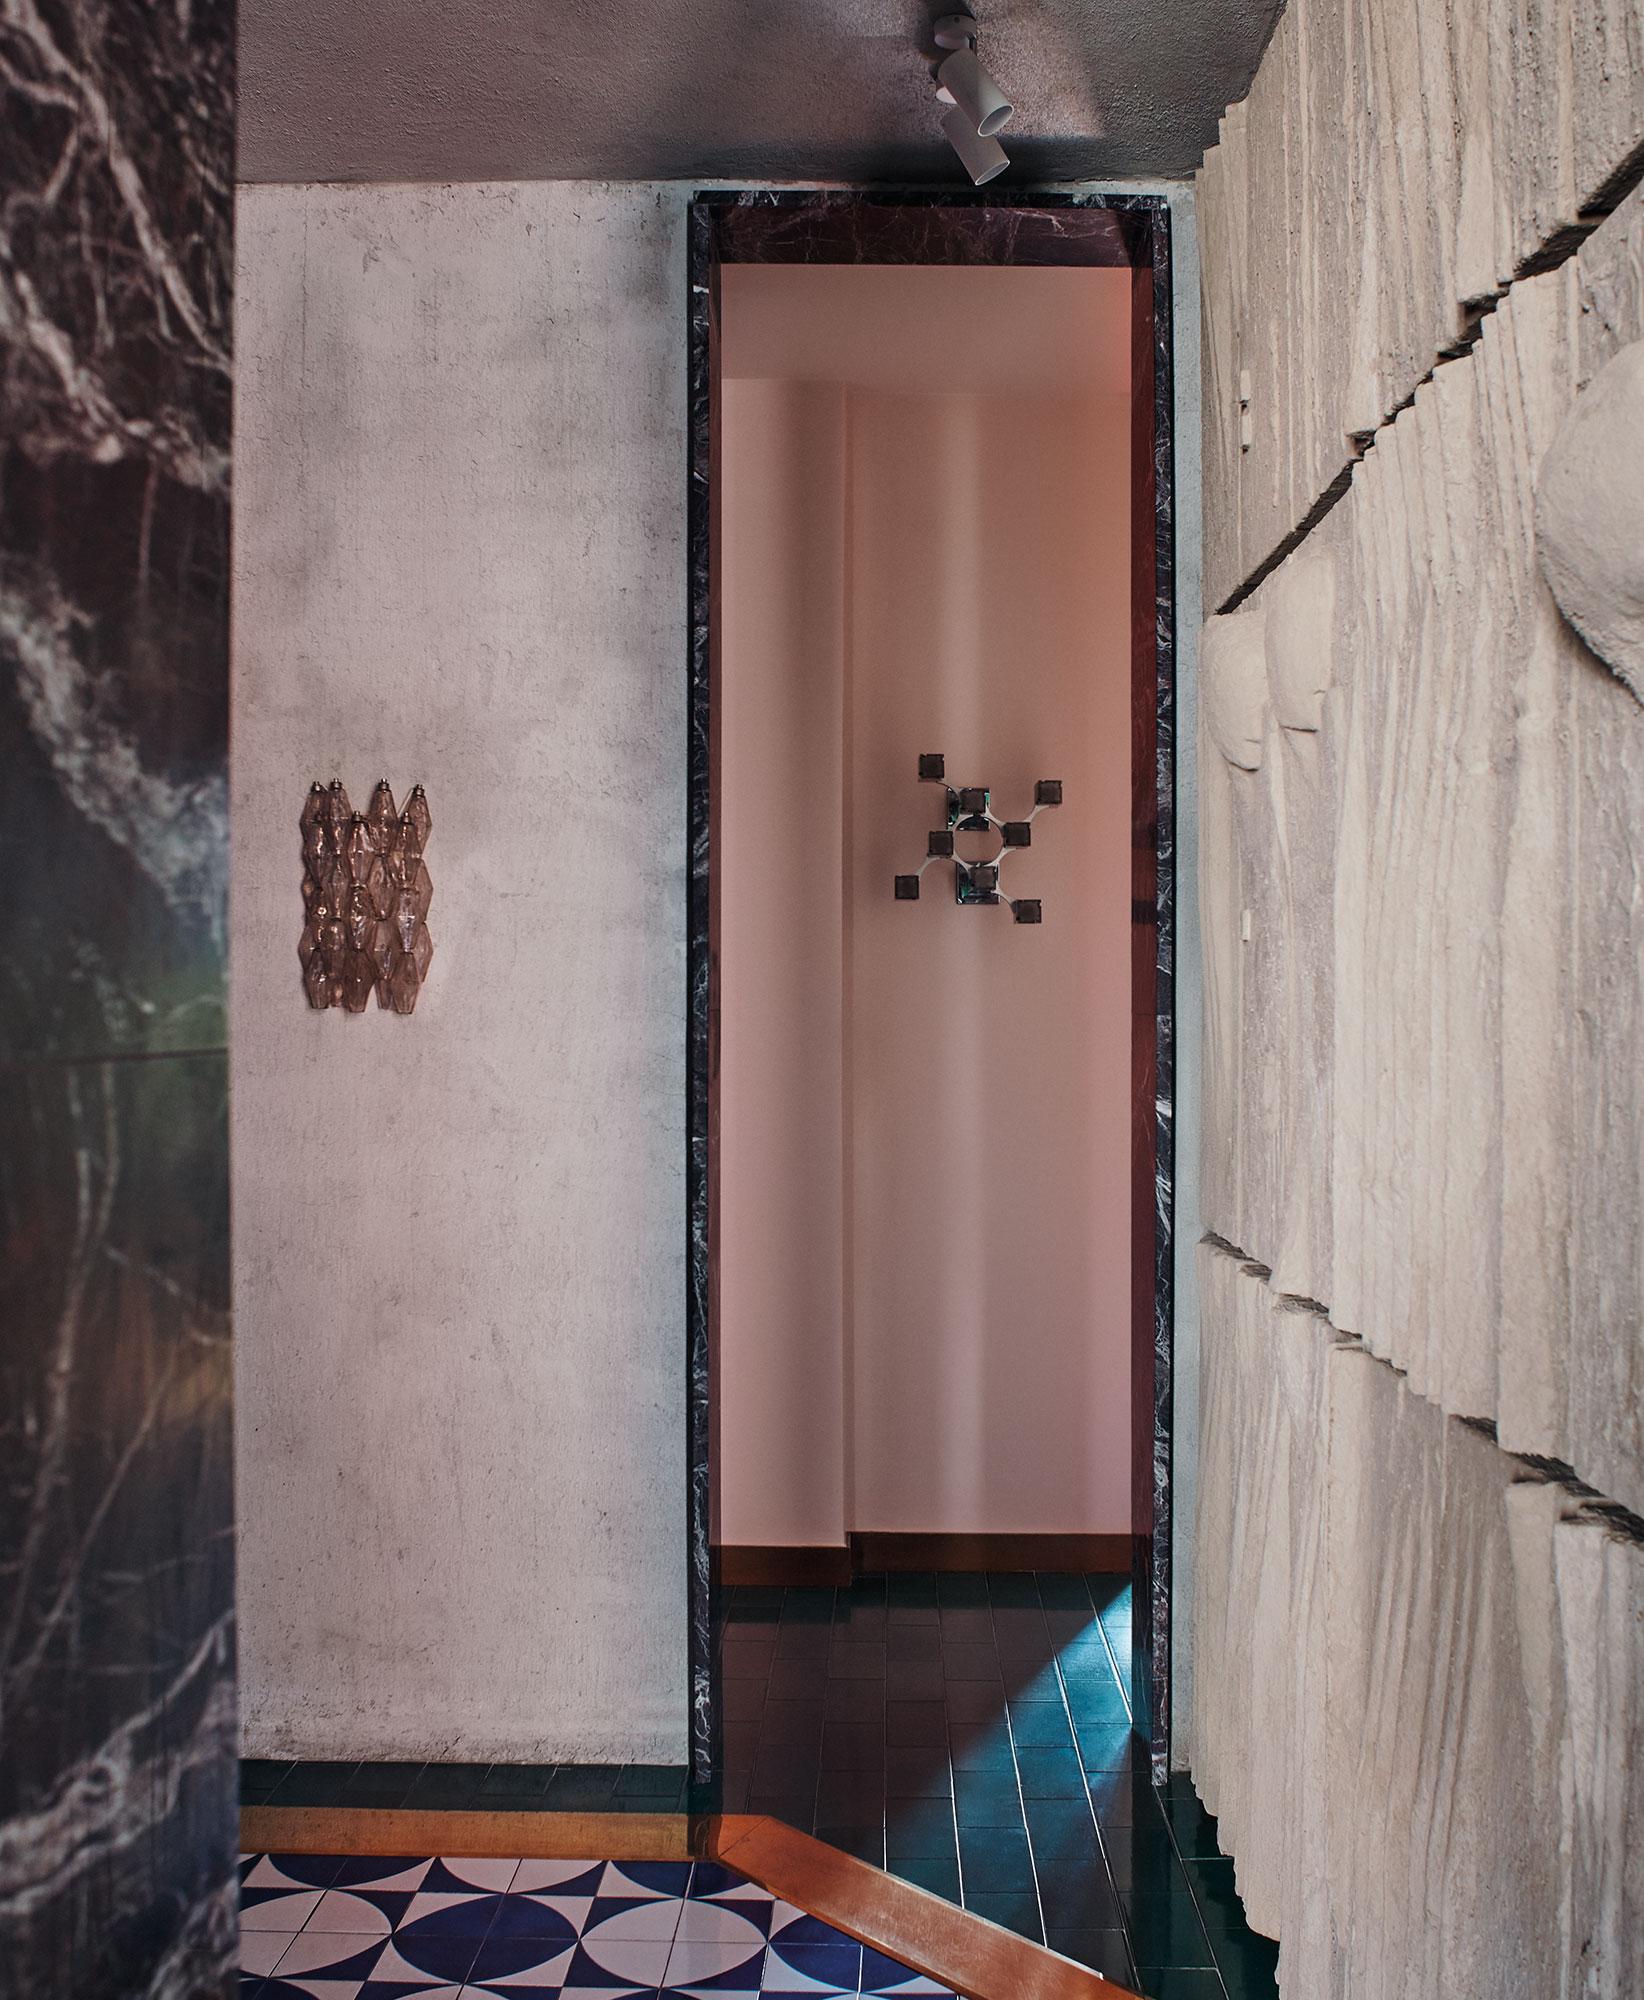 Elle Decor Cover Story September 2018 | Andrea Ferrari | Elle Decor | Numerique Retouch Photo Retouching Studio